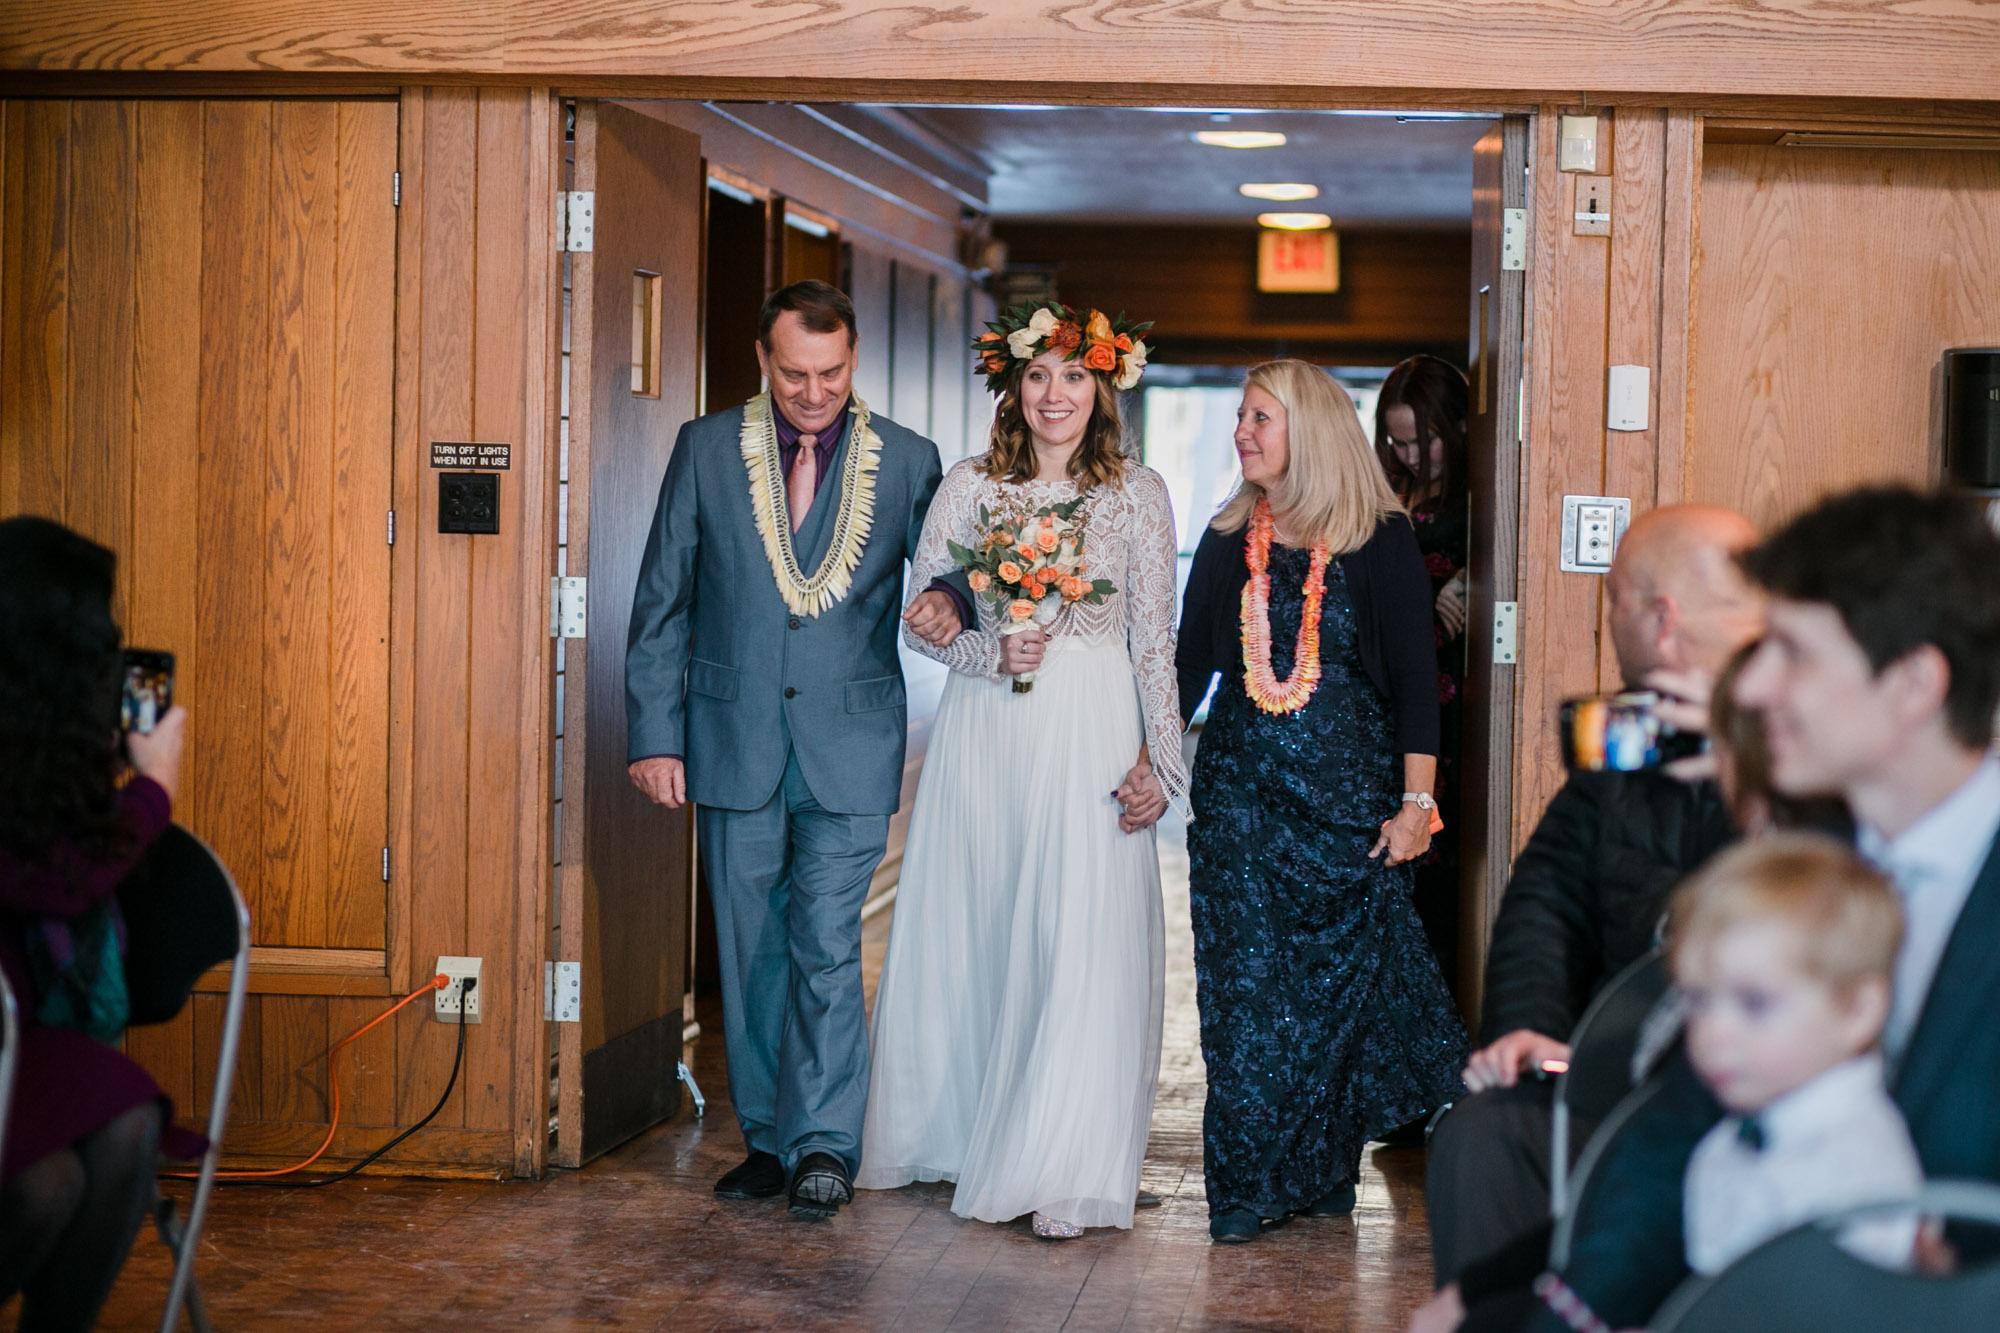 oak-openings-lodge-wedding-8587.jpg